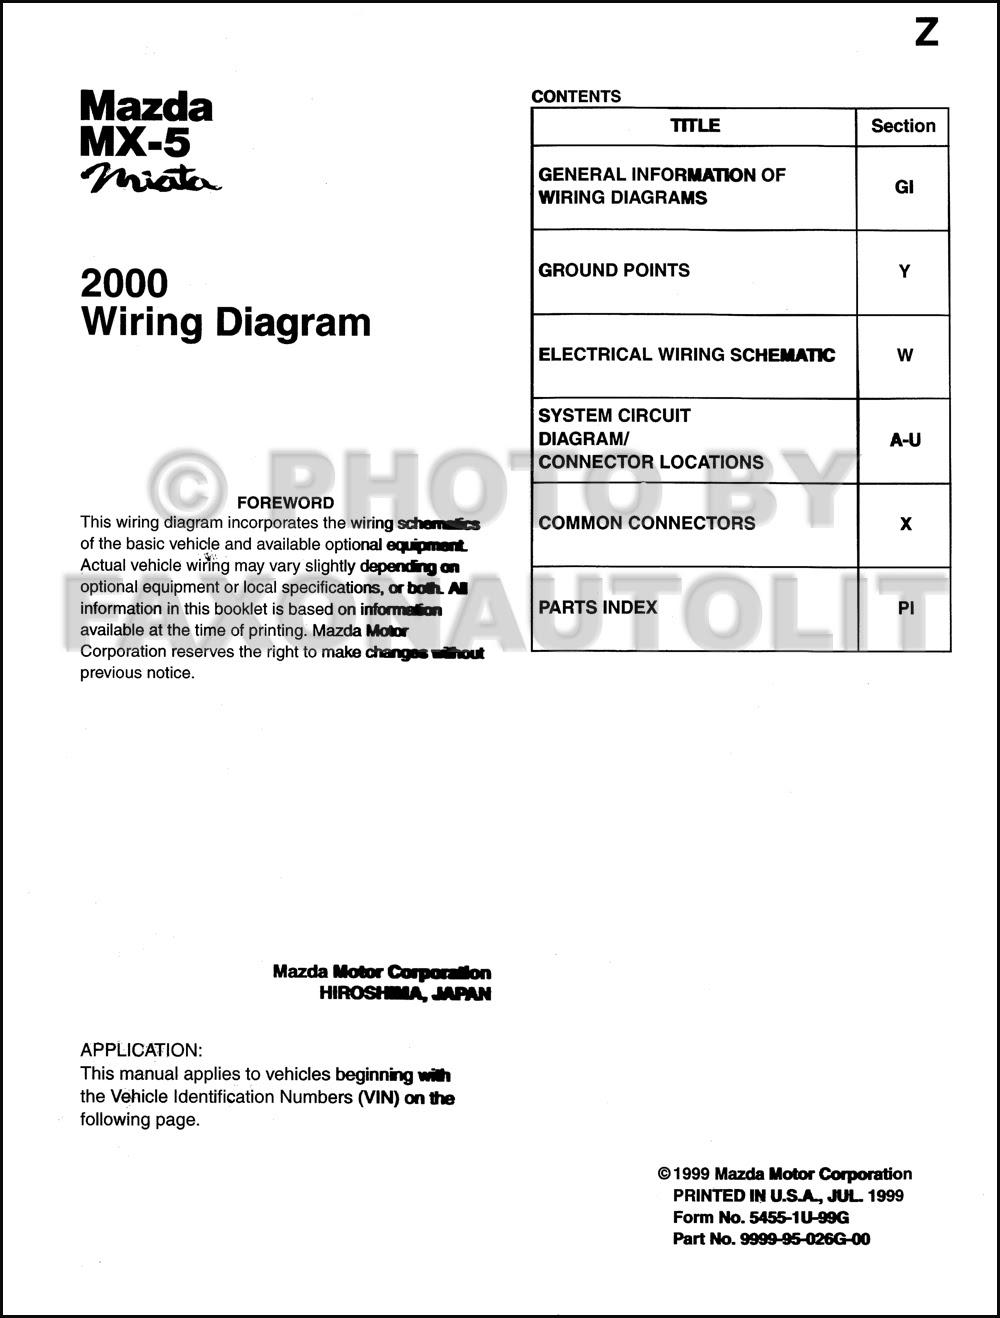 Diagram 2002 Mazda Mx 5 Miata Wiring Diagram Original Full Version Hd Quality Diagram Original Pindiagramh Anticheopinioni It